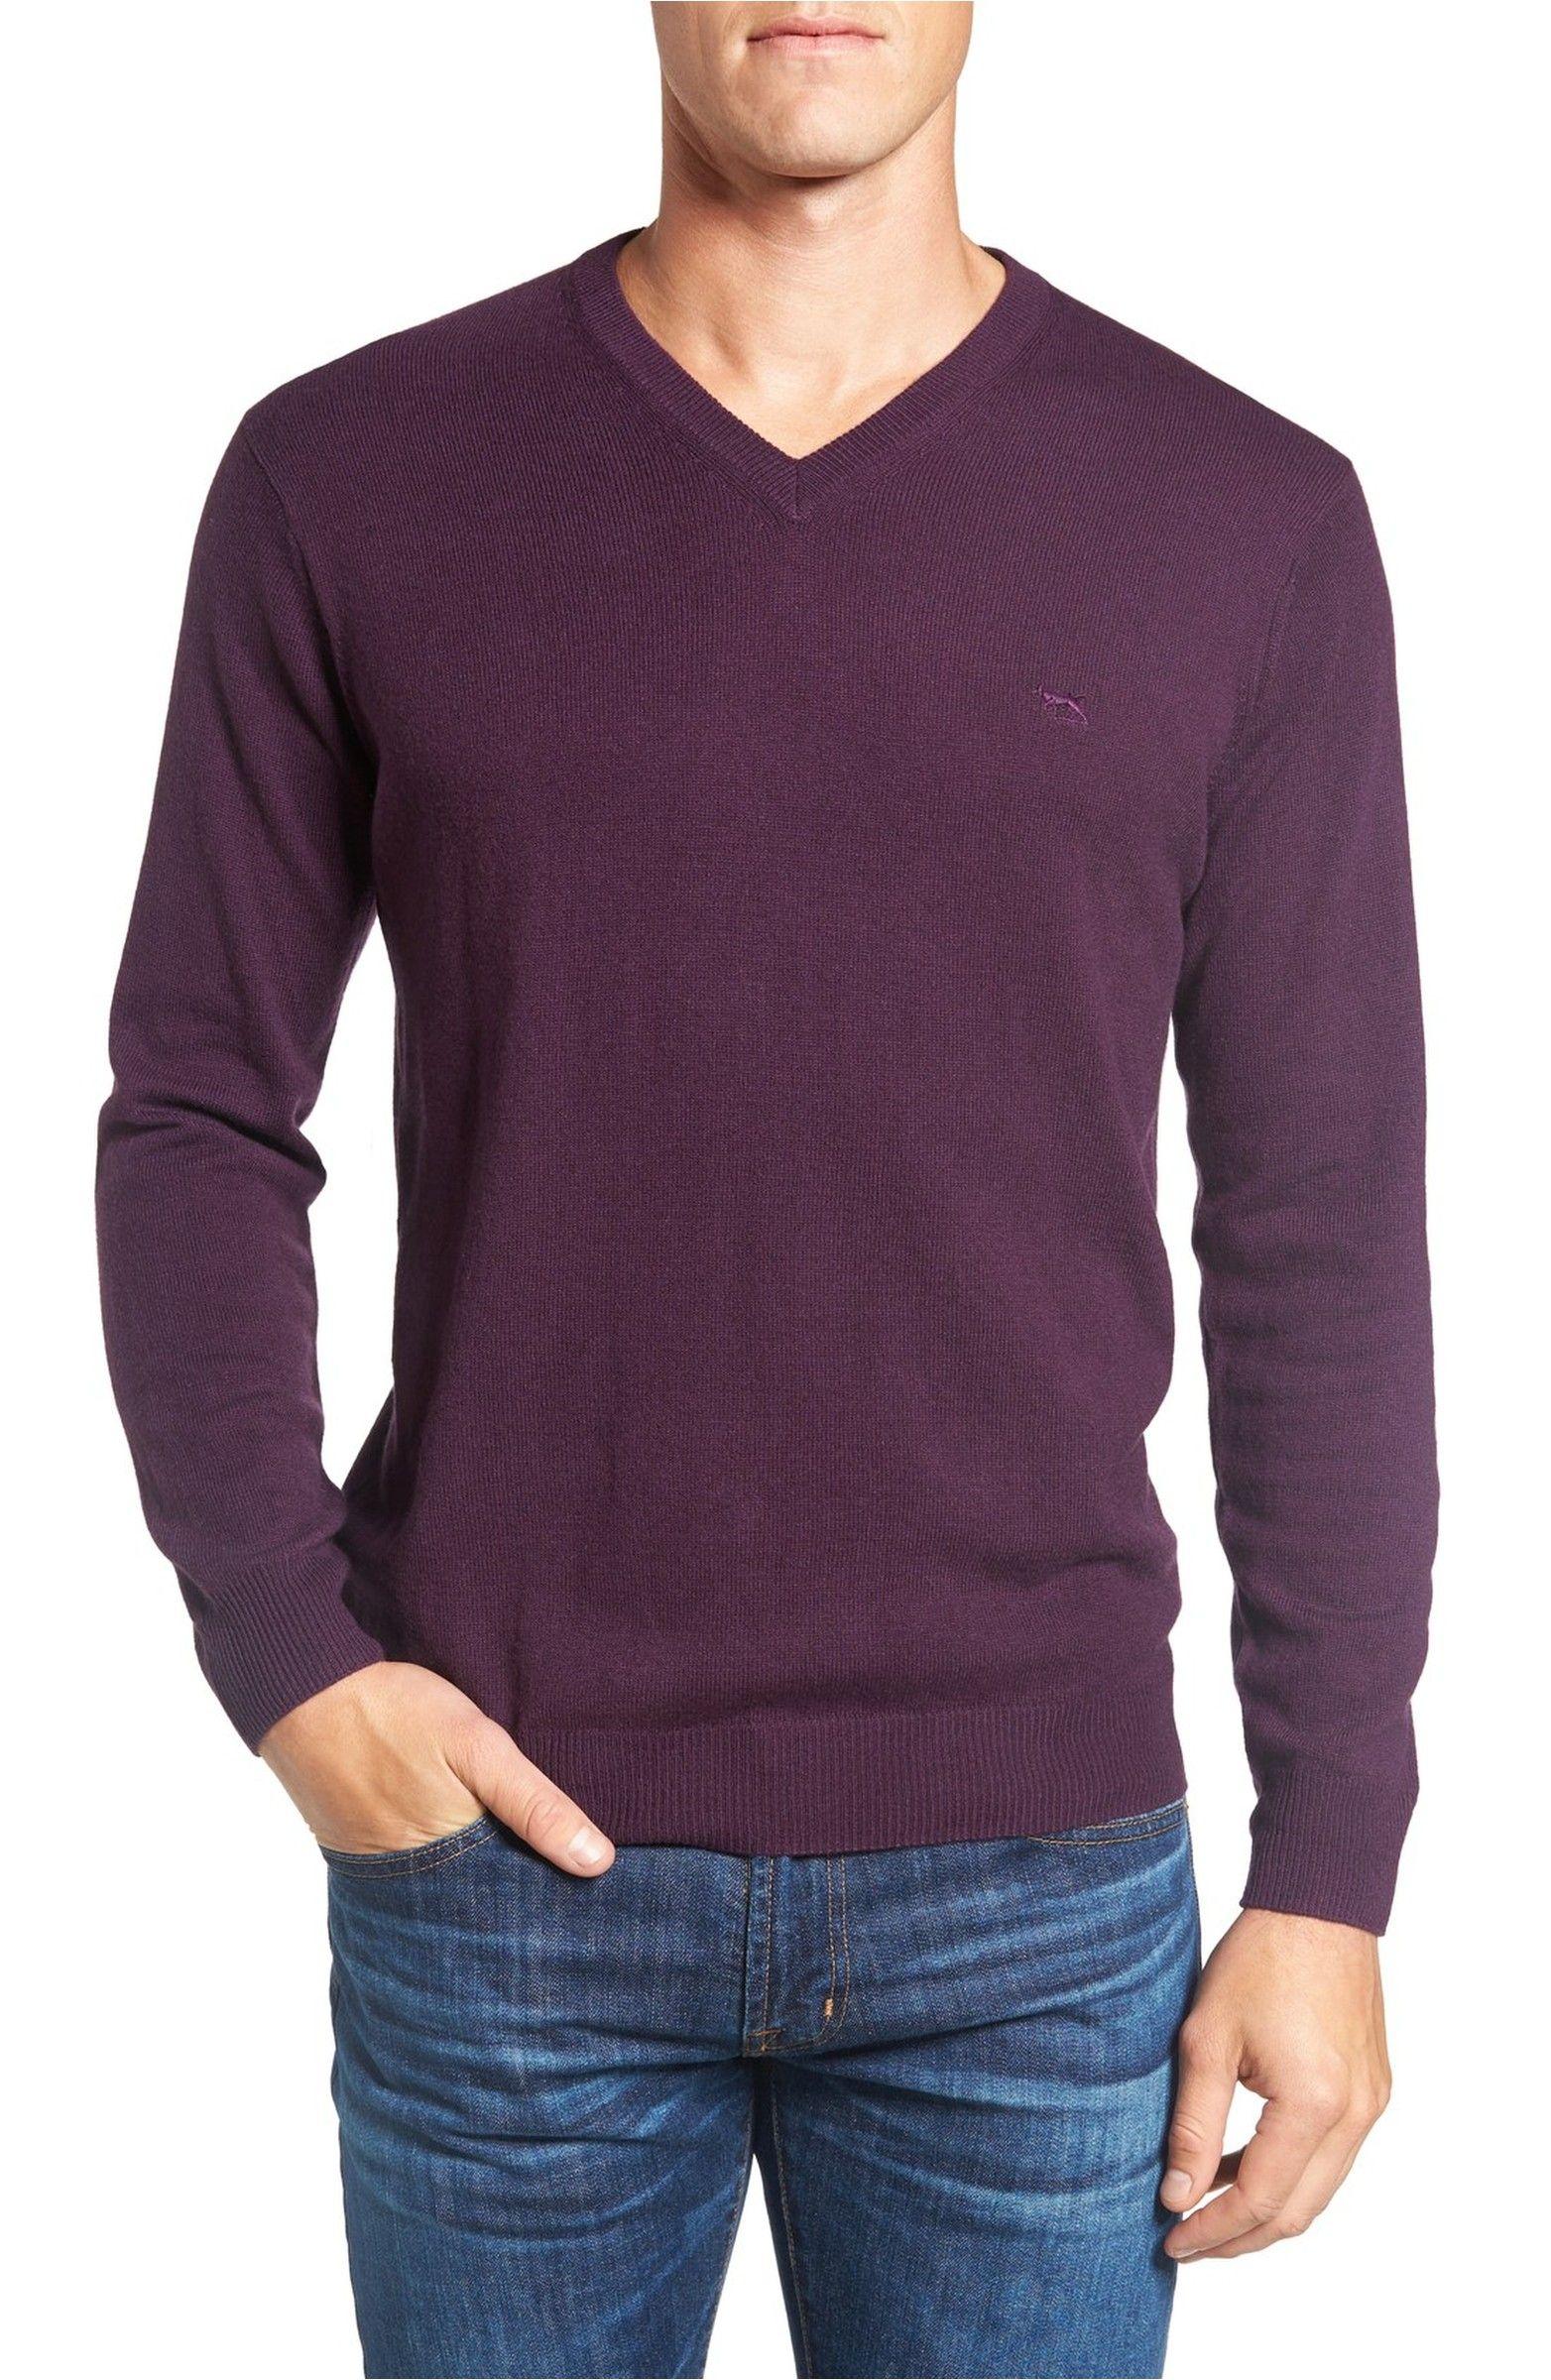 Main Image - Rodd & Gunn 'Inchbonnie' Wool & Cashmere V-Neck Sweater